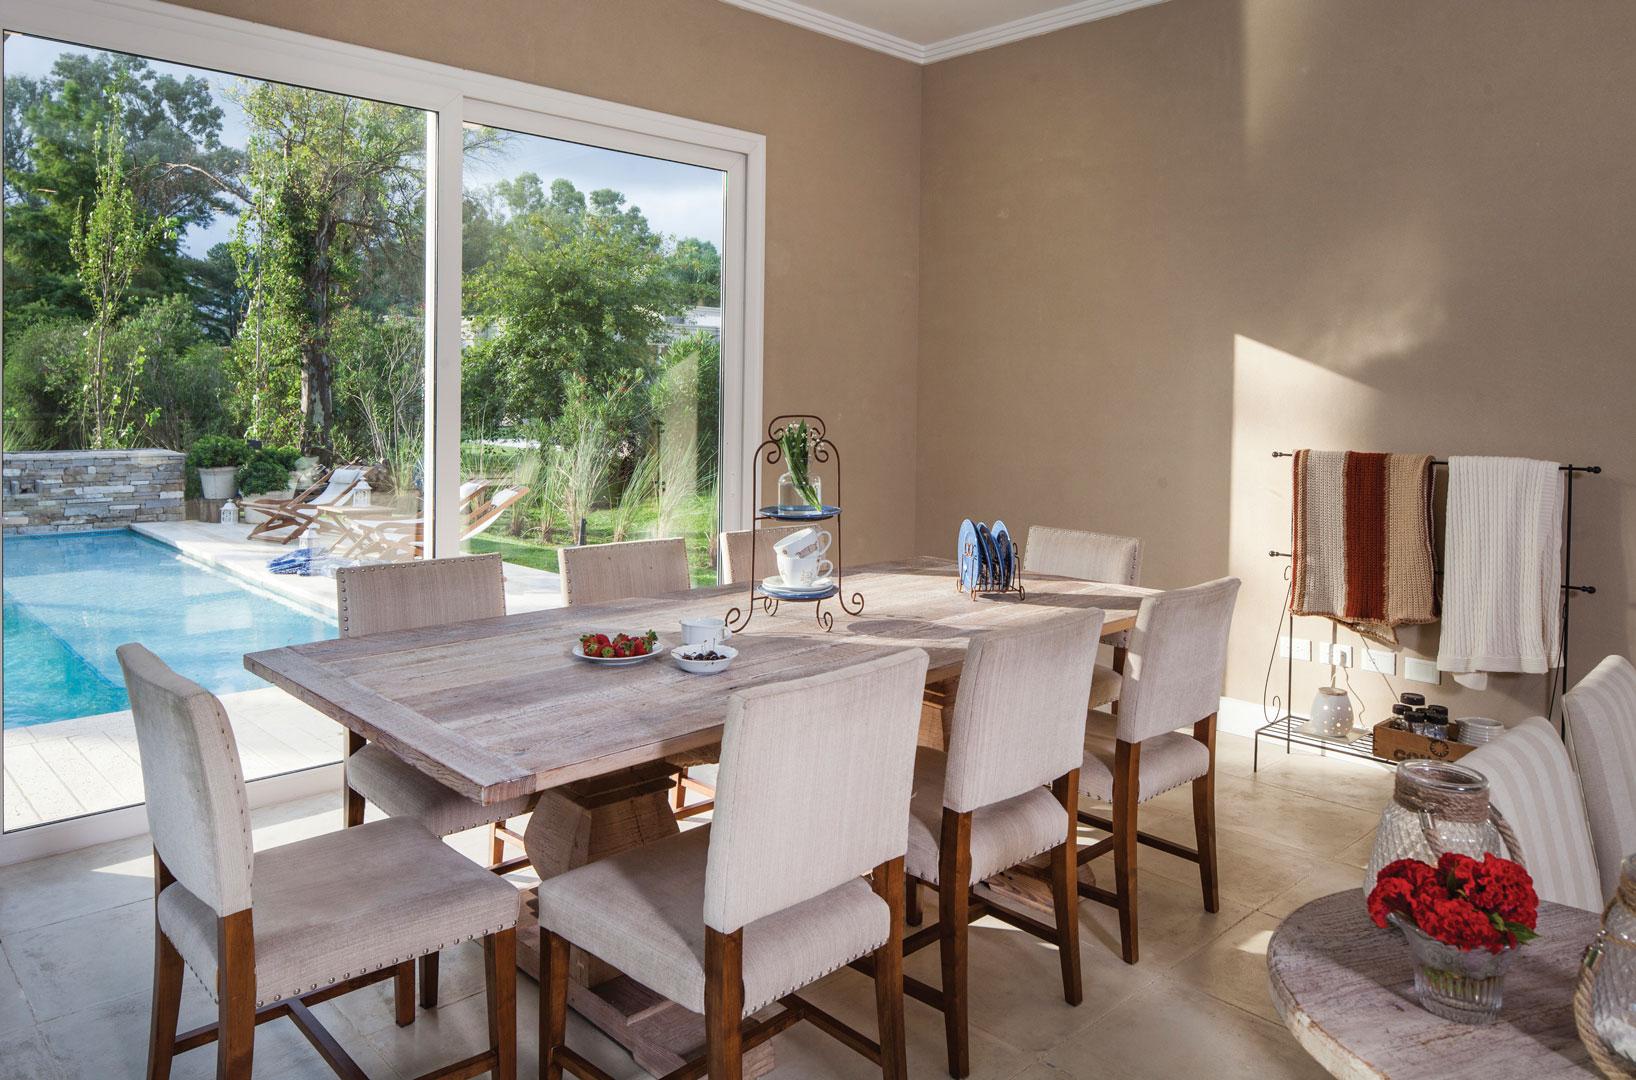 Arquitecto daniel tarr o y asociados casa estilo cl sico for Casa clasica country